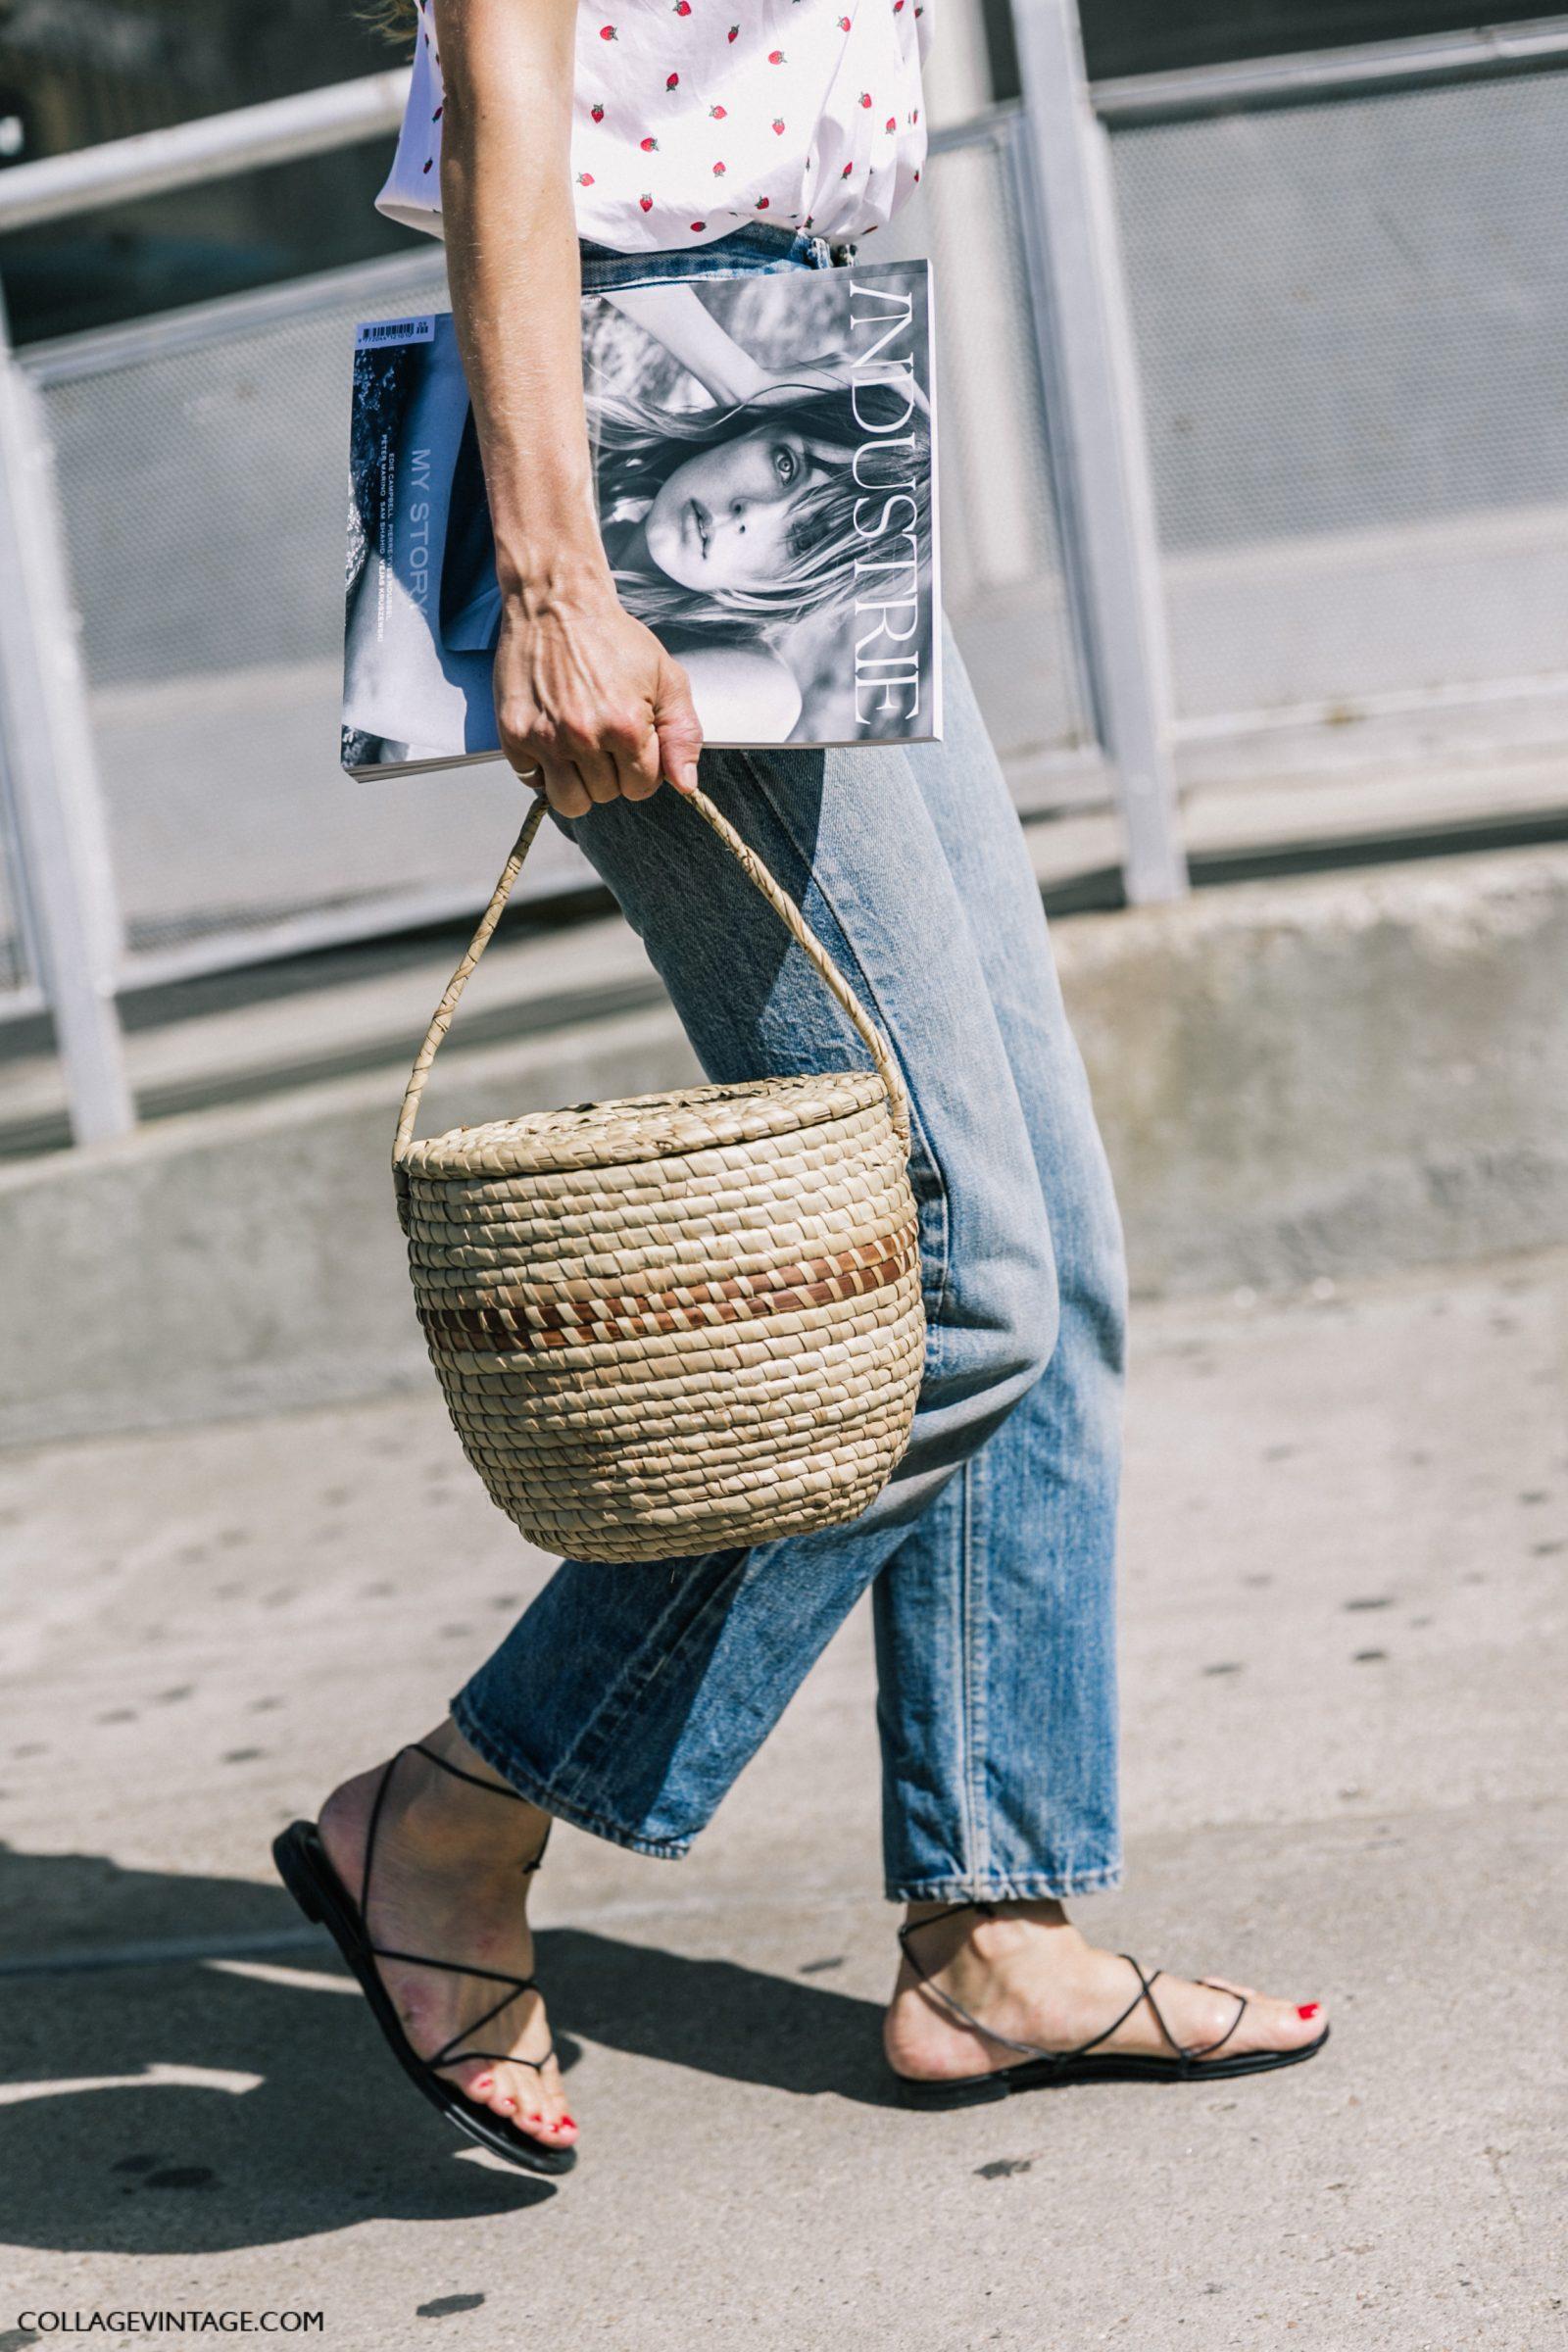 nyfw-new_york_fashion_week_ss17-street_style-outfits-collage_vintage-vintage-atuzarra-5